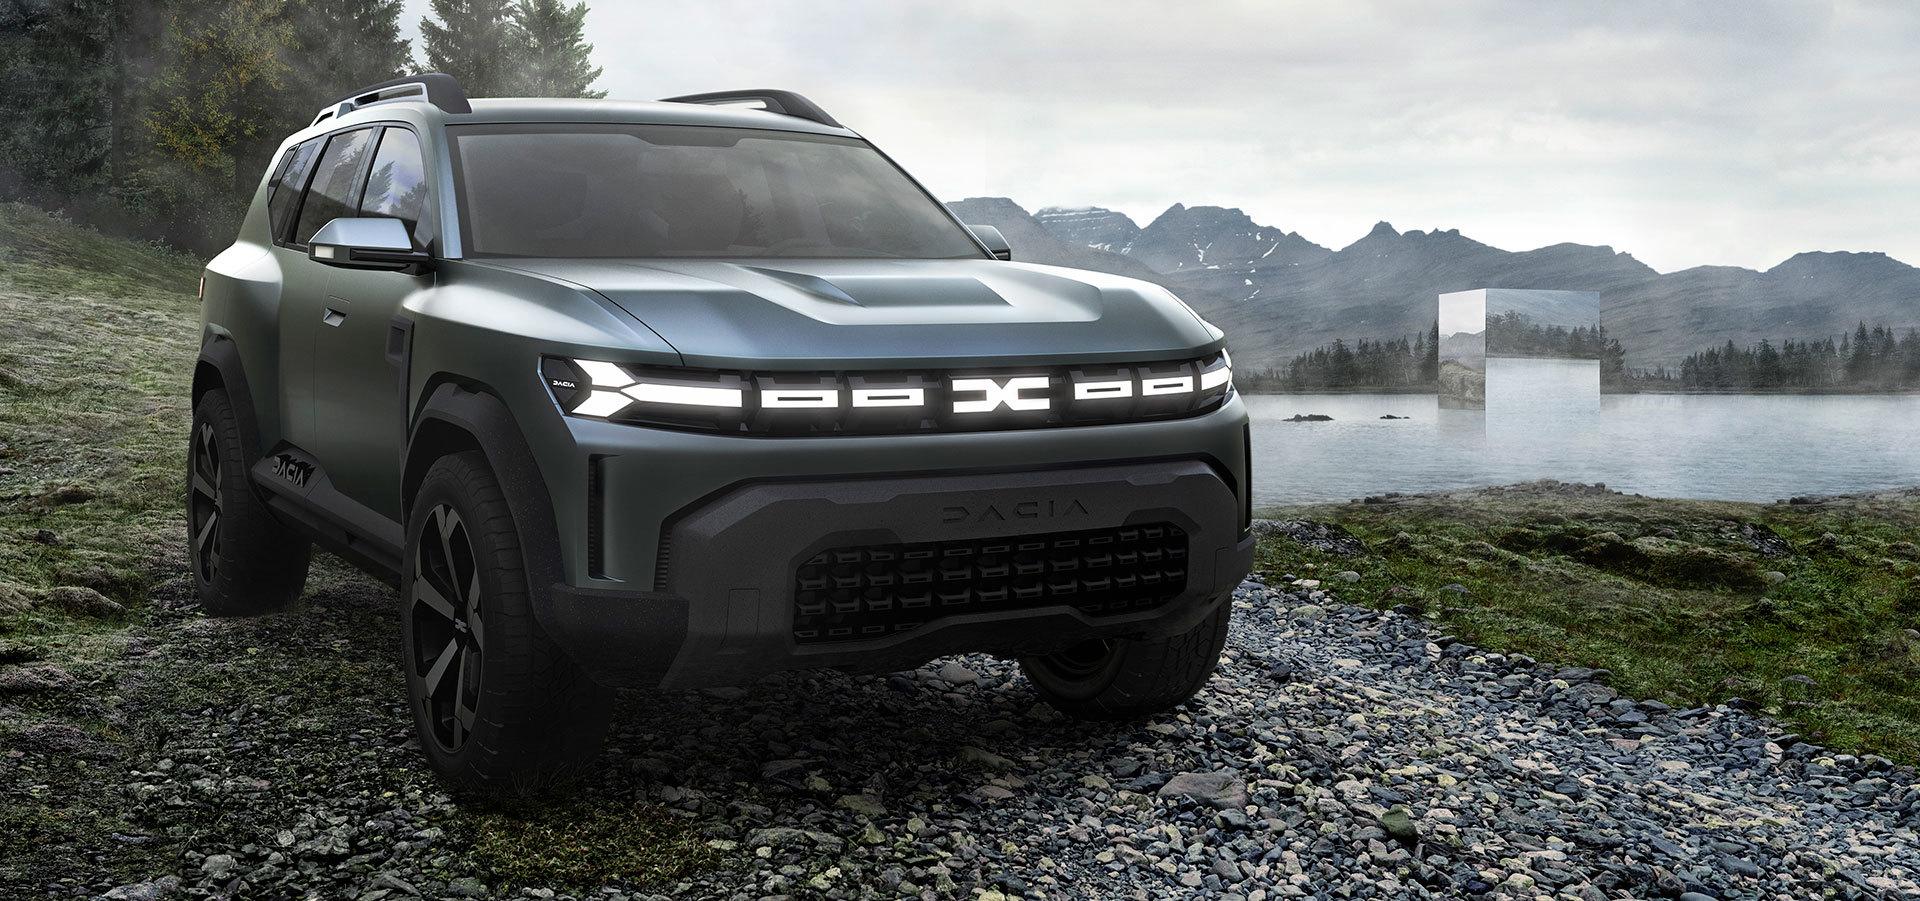 Dacia Bigster Plan 2025